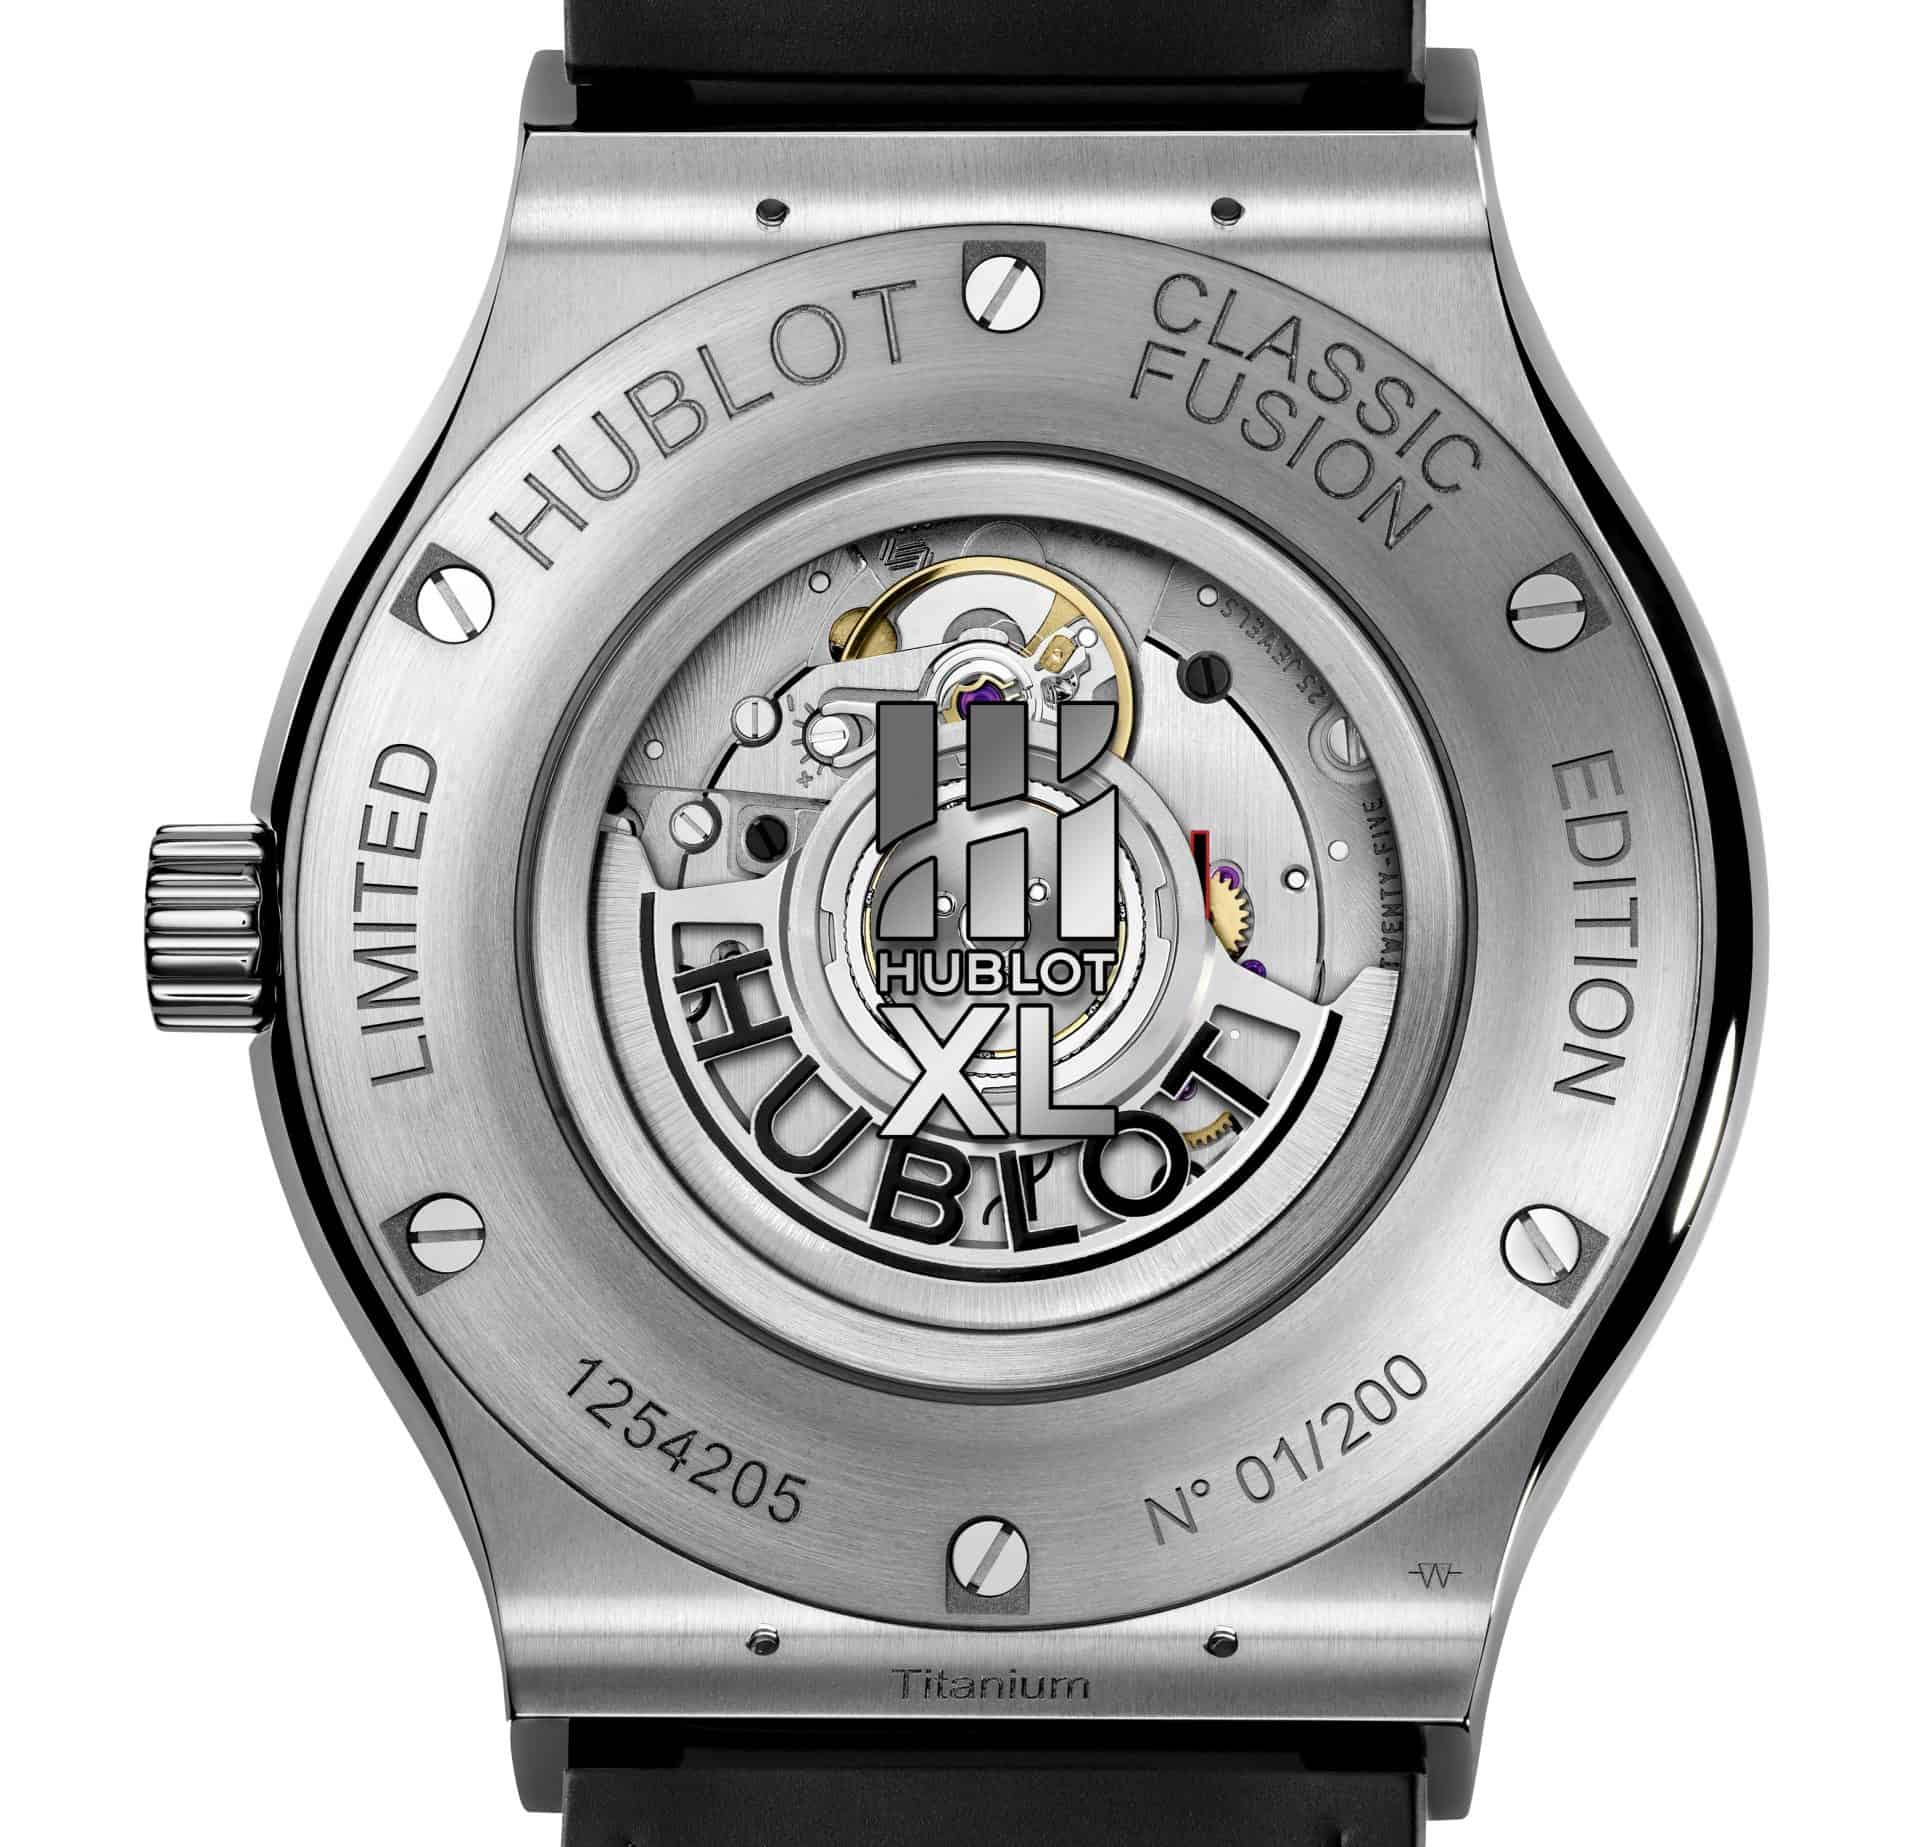 Hublot Classic Fusion 40th Anniversary Kaliber HUB1112 mit Glasboden